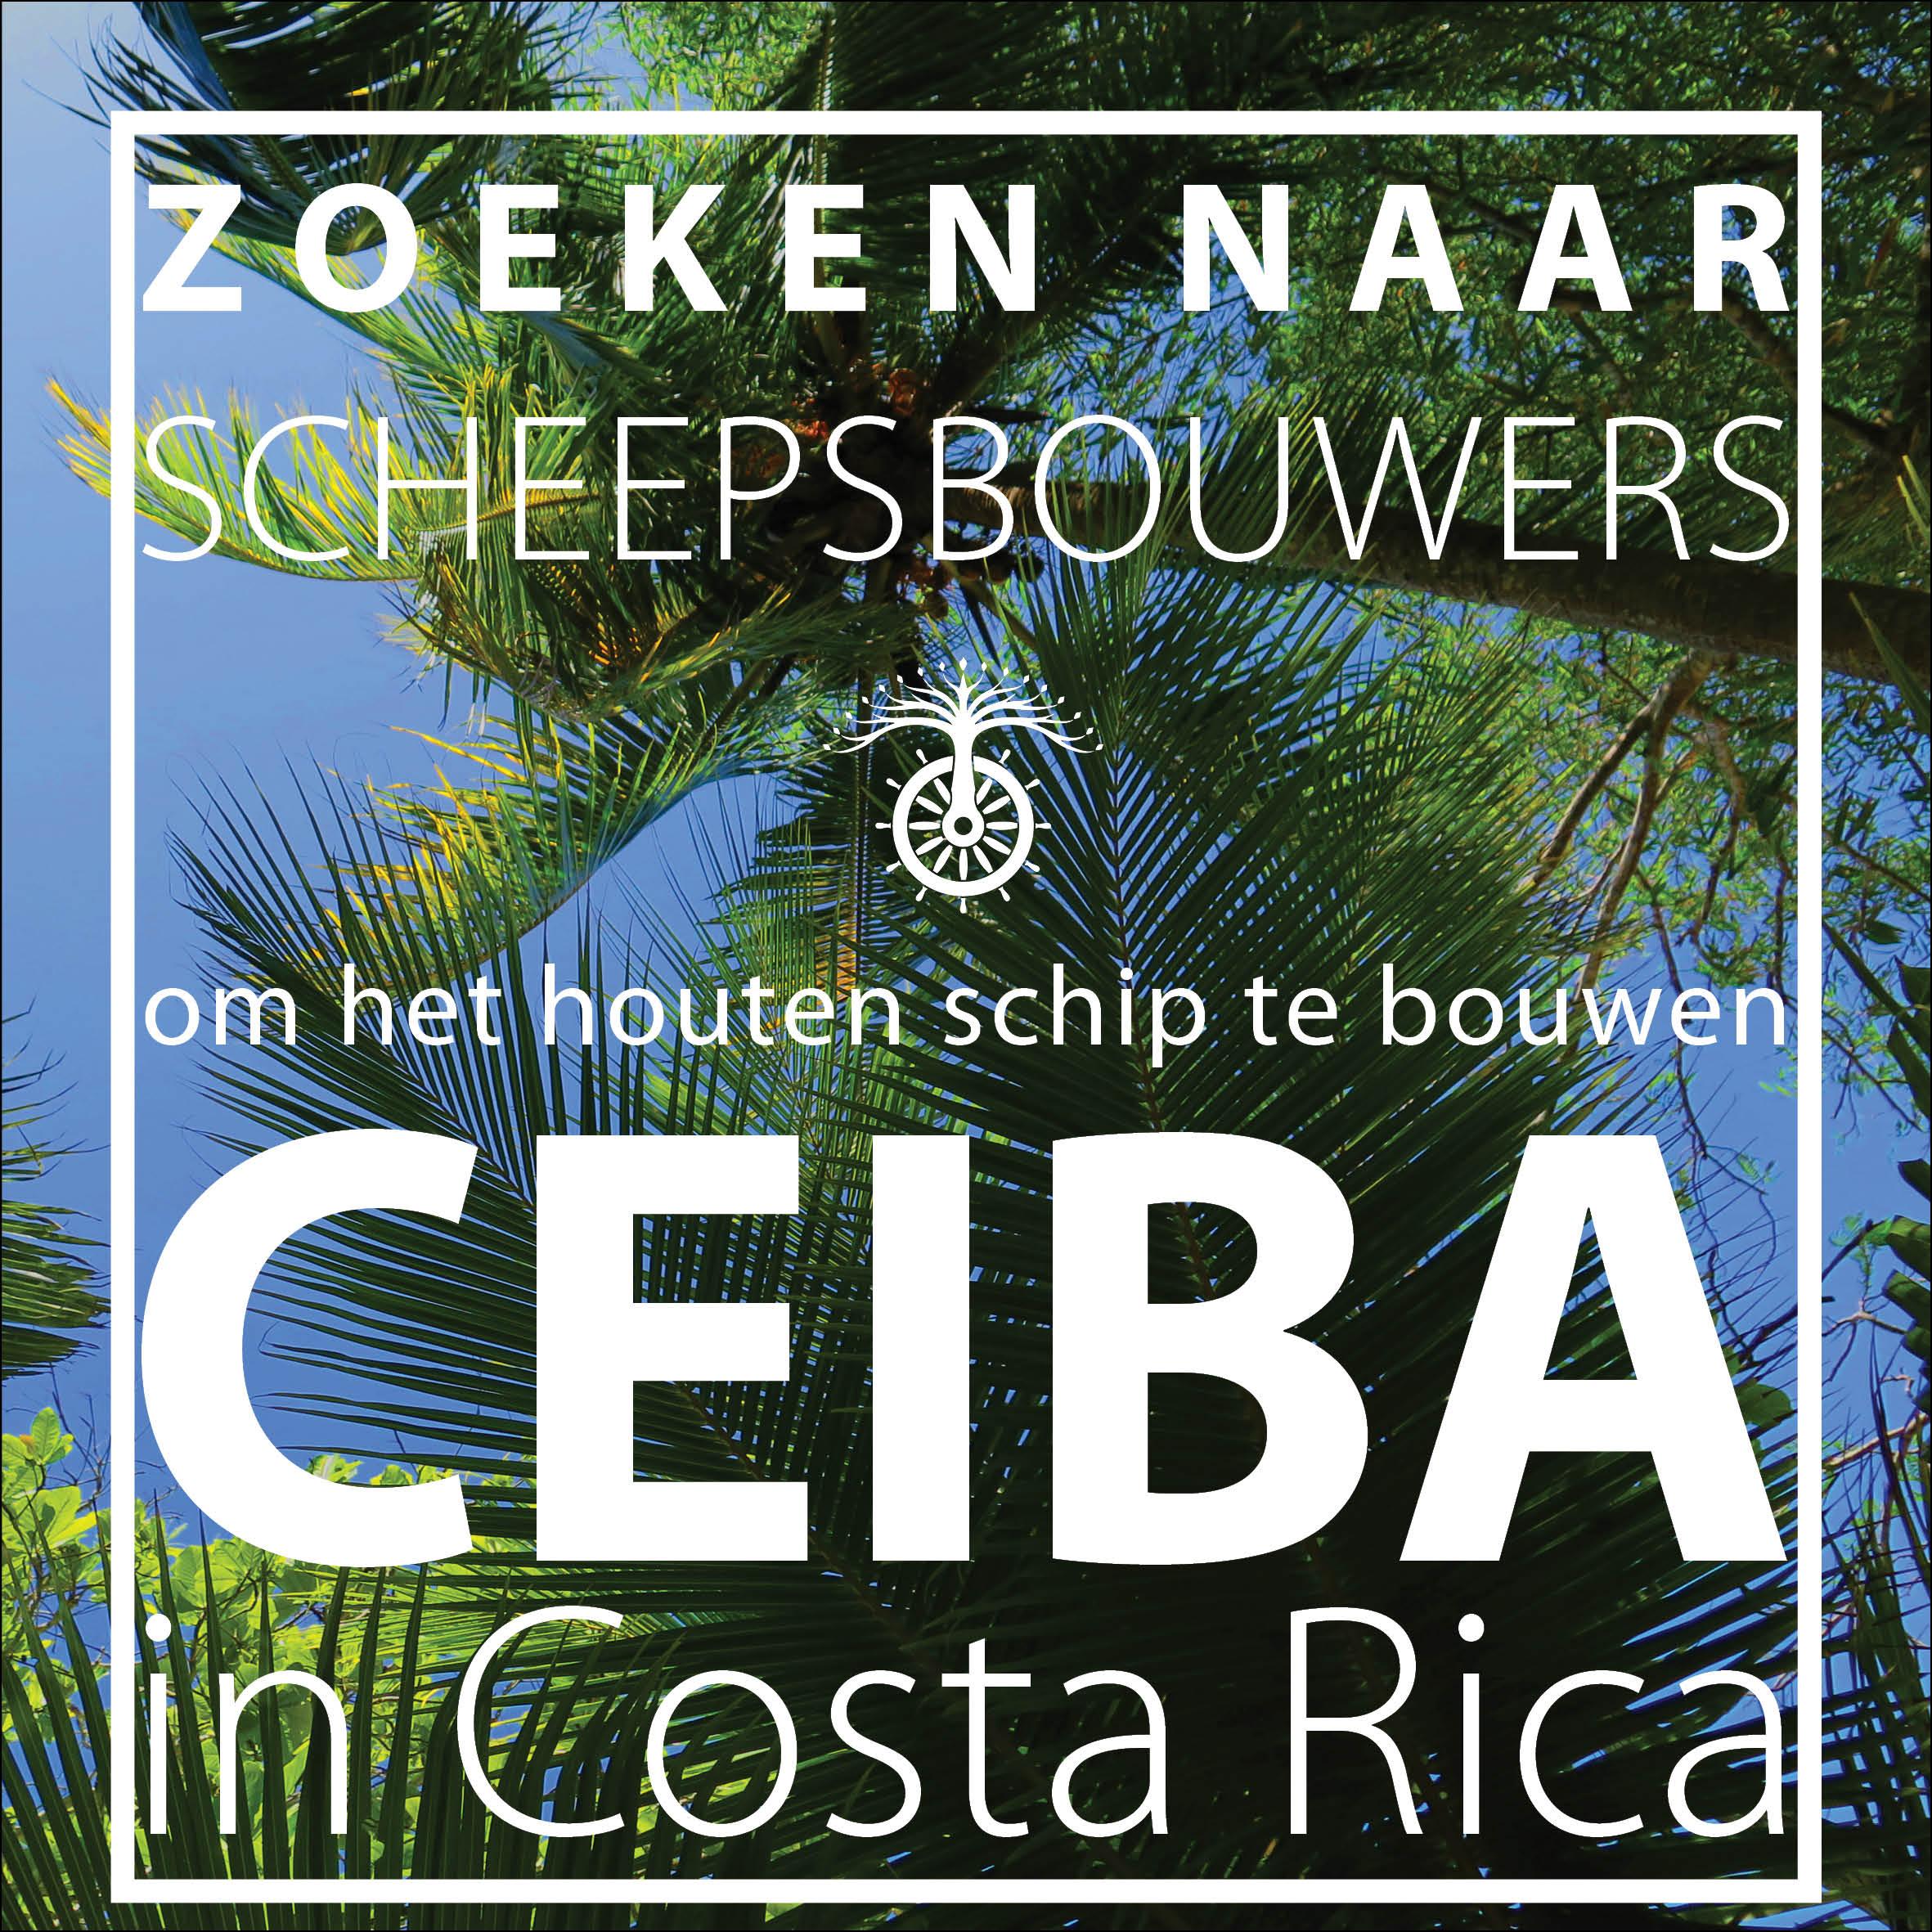 CALL FOR SHIPWRIGHTS NEDERLANDS.jpg